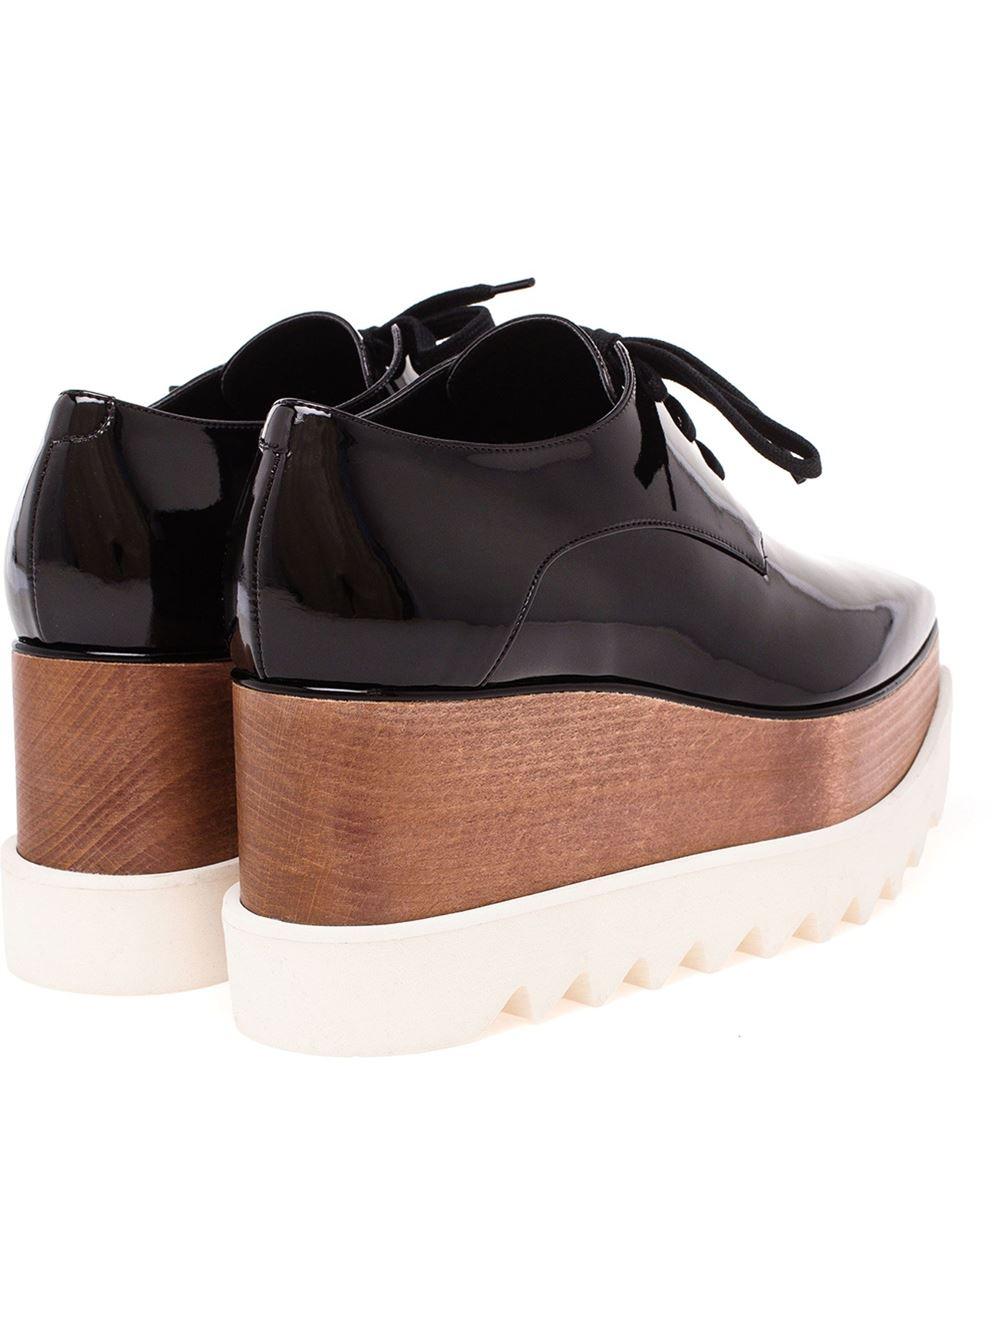 Mccartney 'elyse' Flatform Shoes - Browns - Farfetch.com